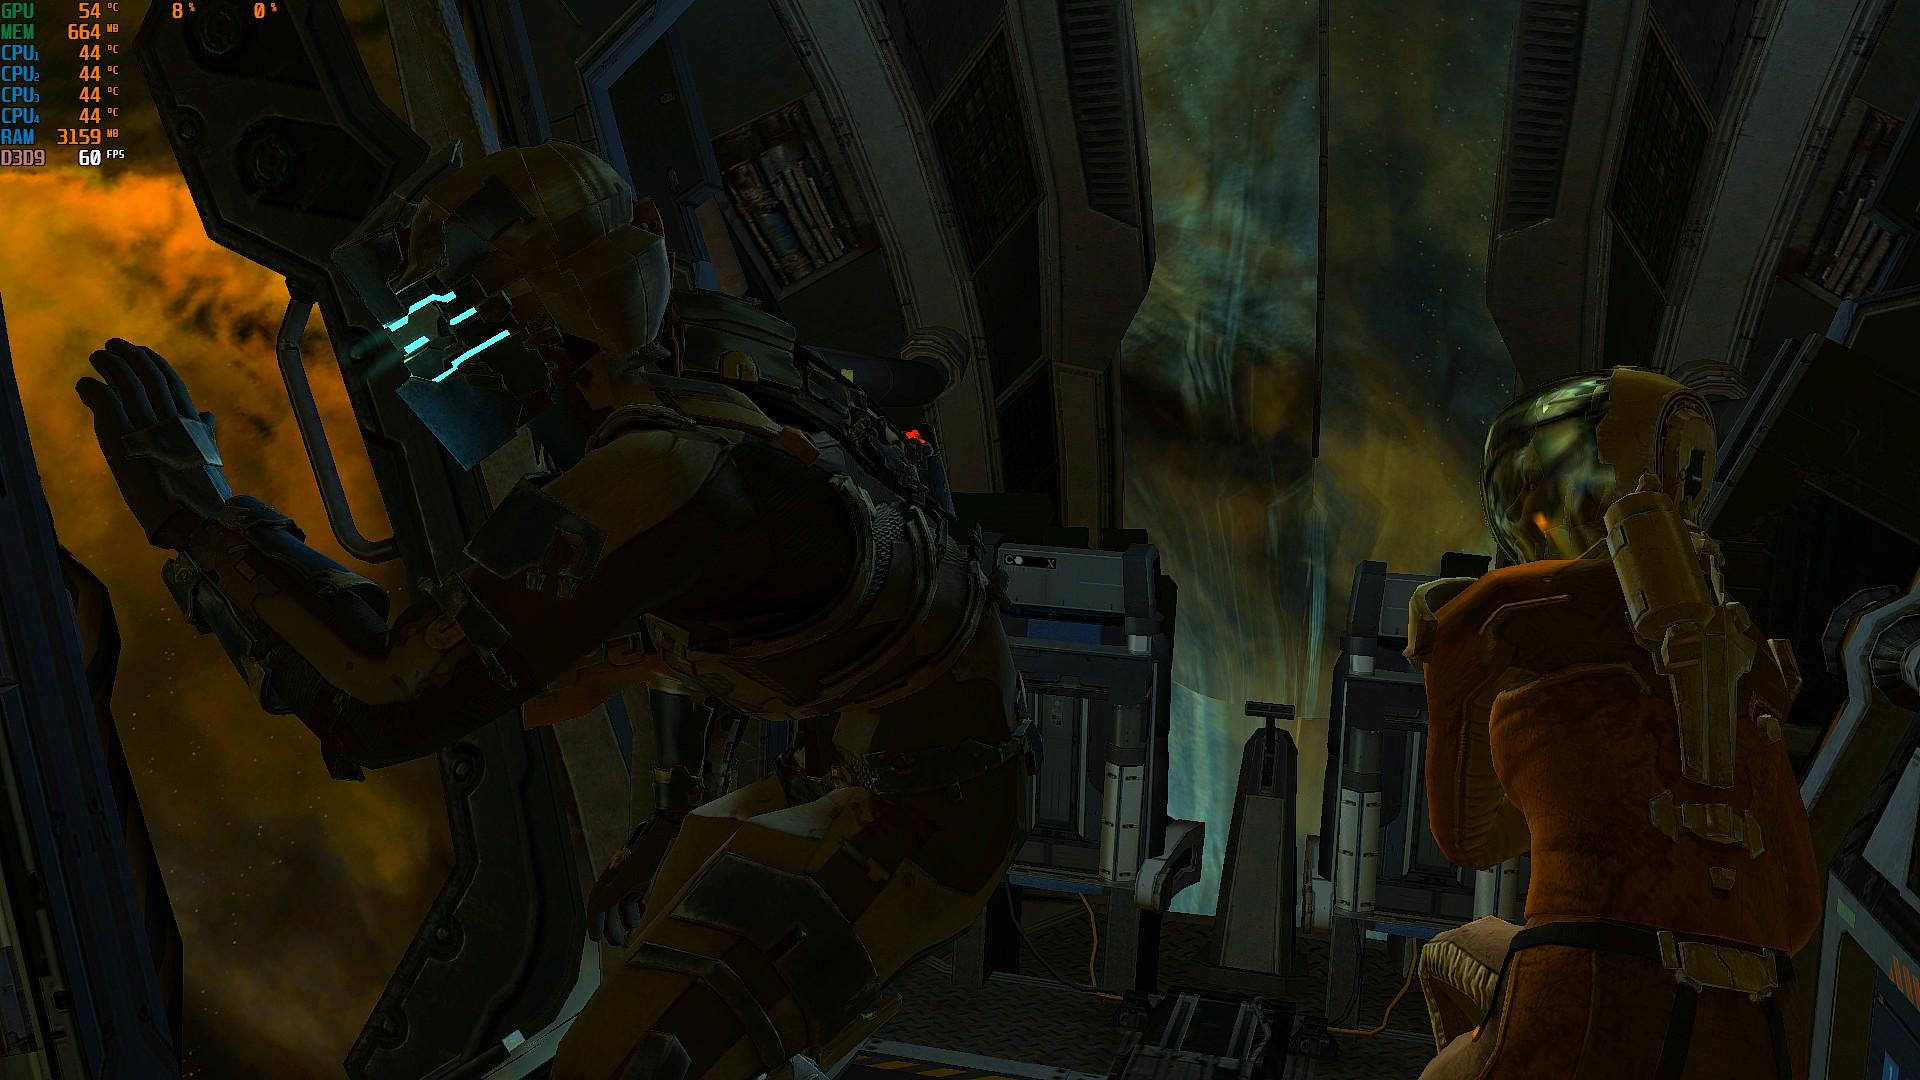 000239.Jpg - Dead Space 2